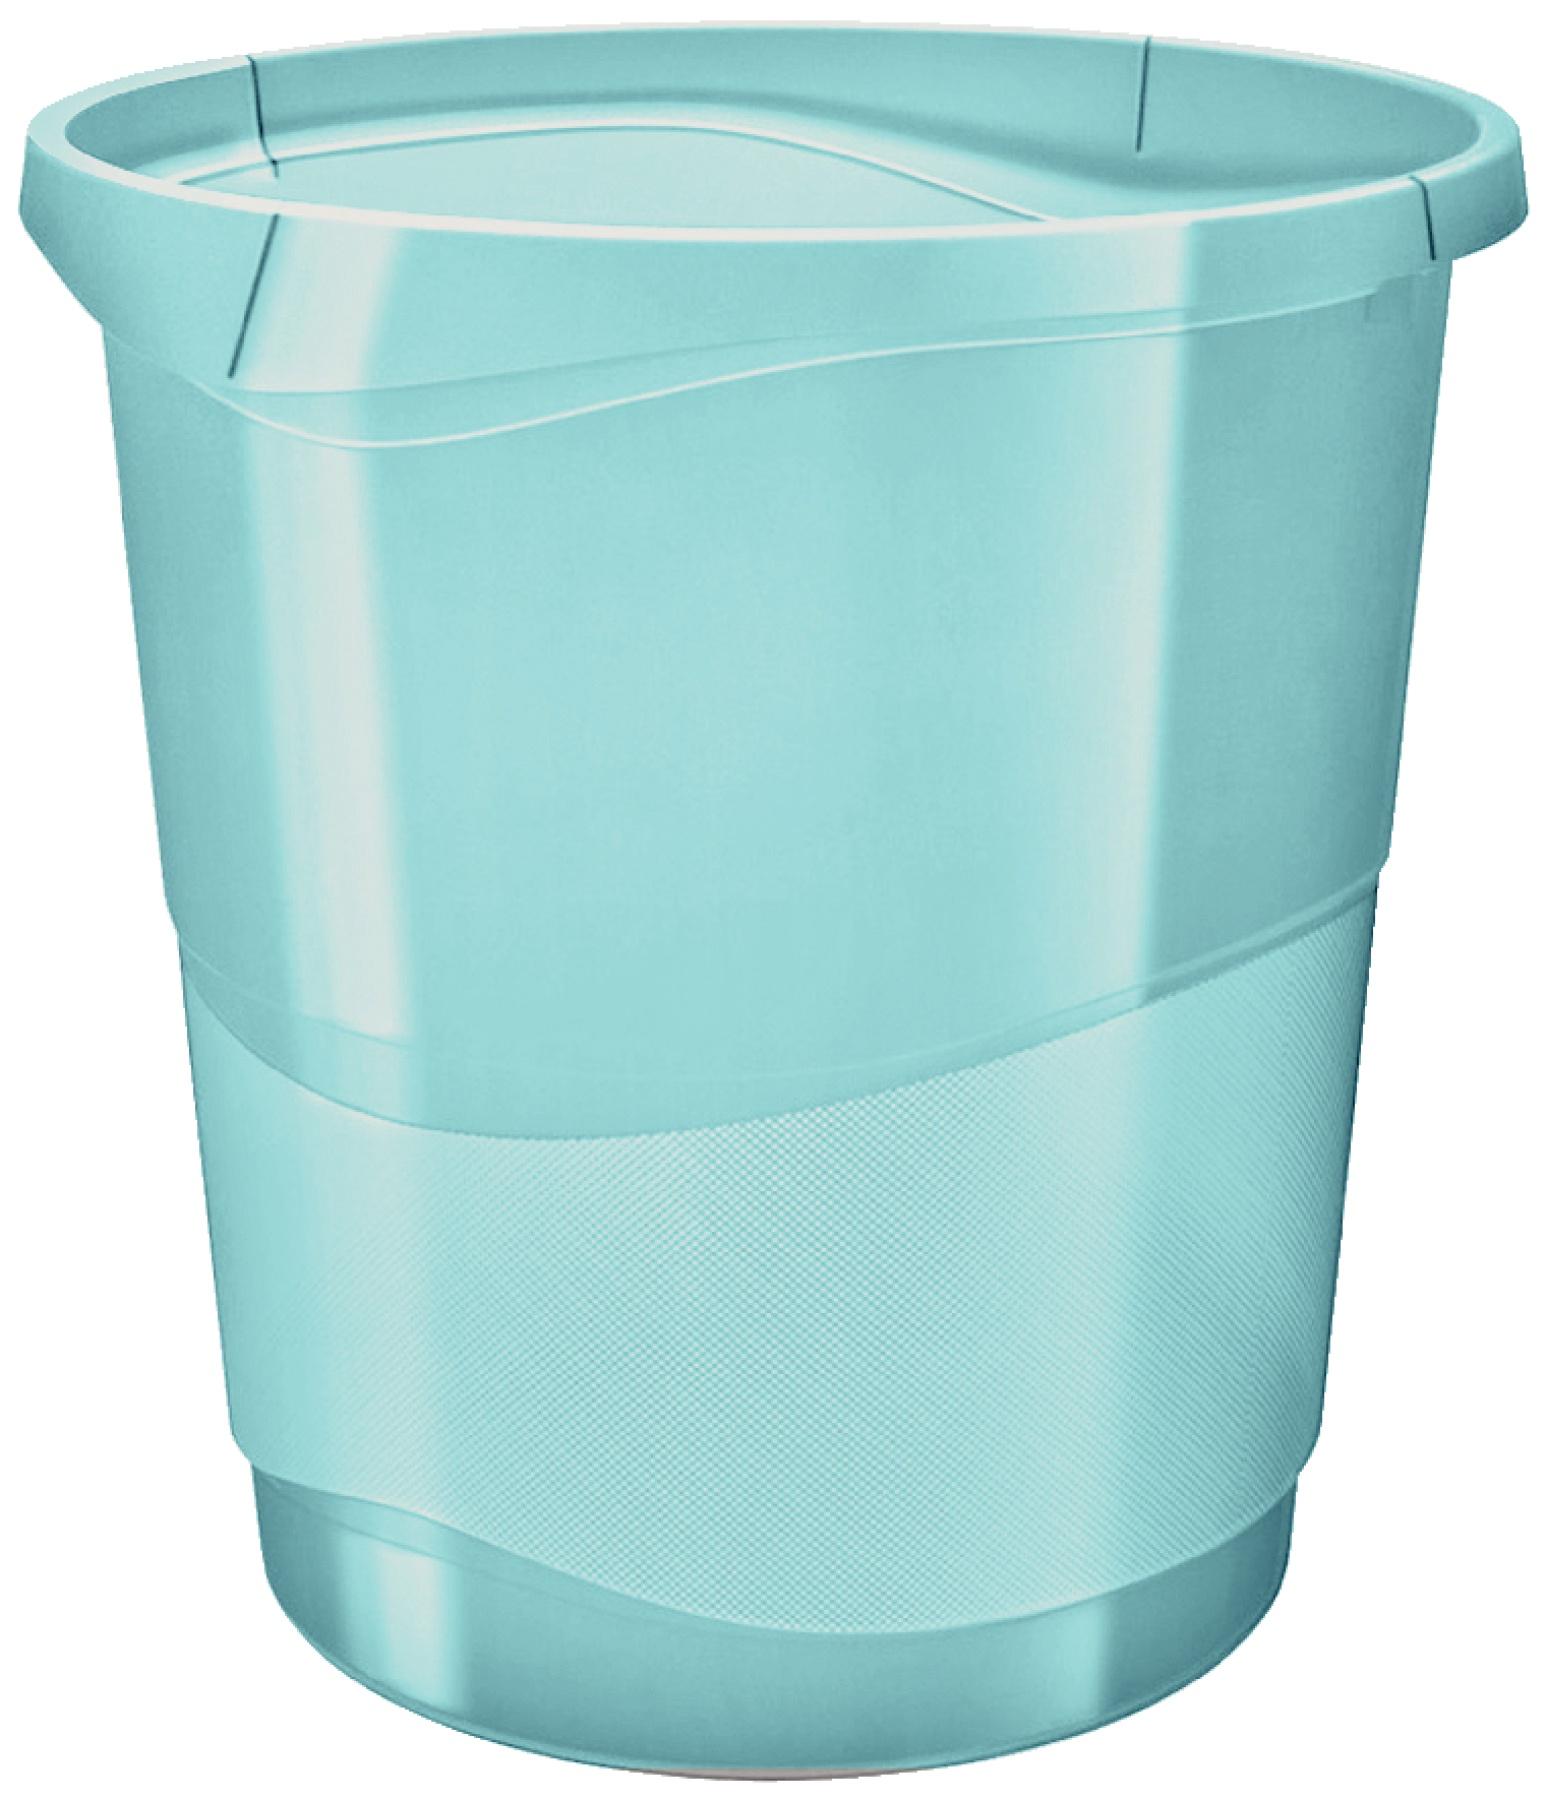 Корзина для мусора Esselte Colour'Ice, синий, 14 л корзина для бумаг цельнолитая синяя 13 литров